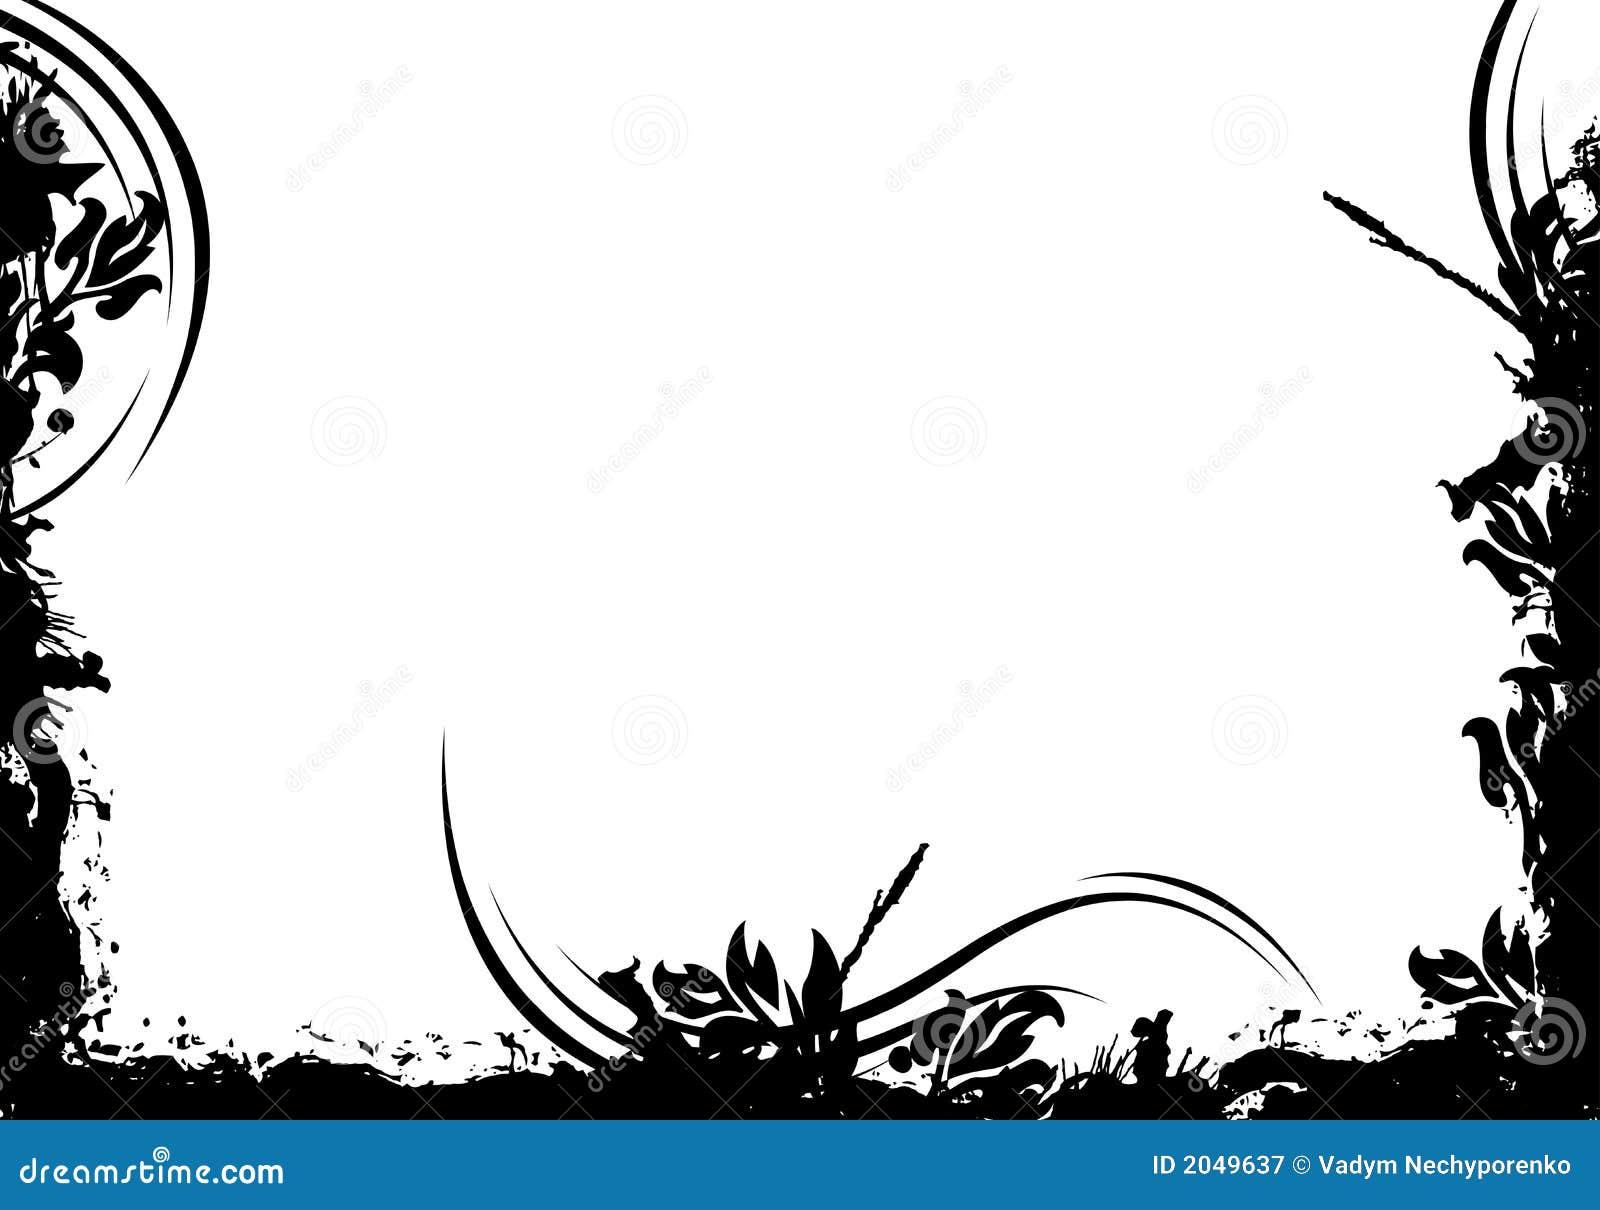 Illustratio preto decorativo floral do vetor do frame do grunge abstrato